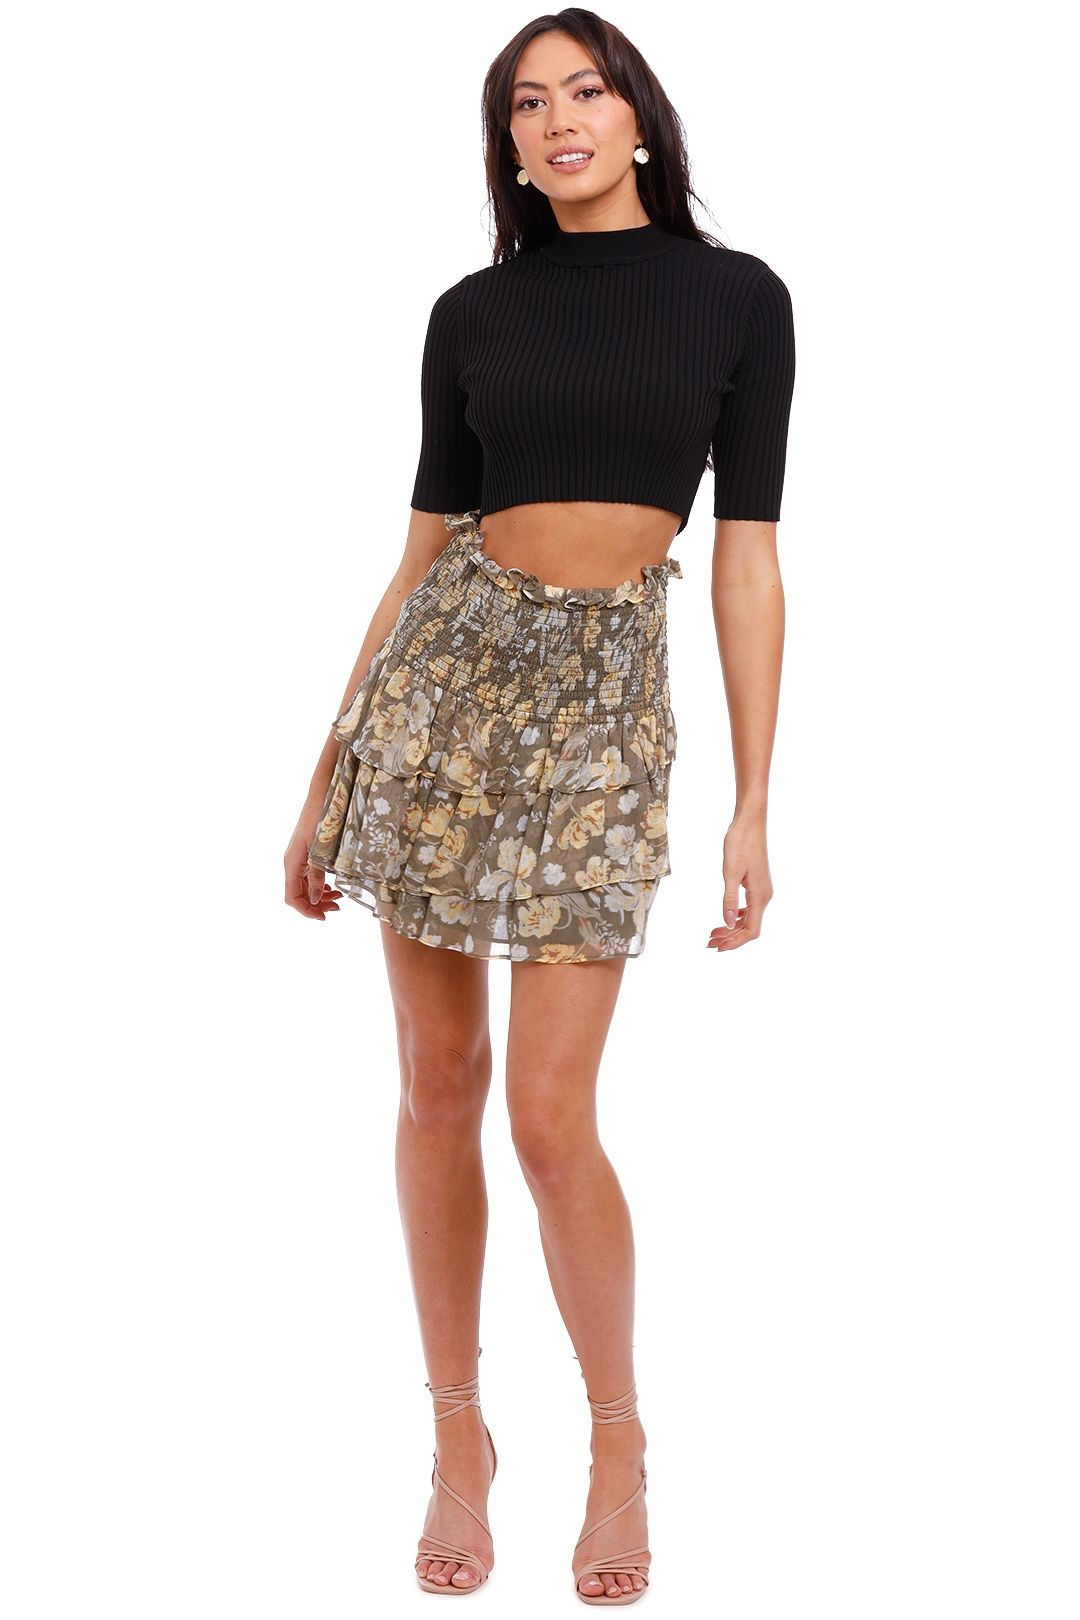 Shona Joy Shirred Ra Ra Skirt mini